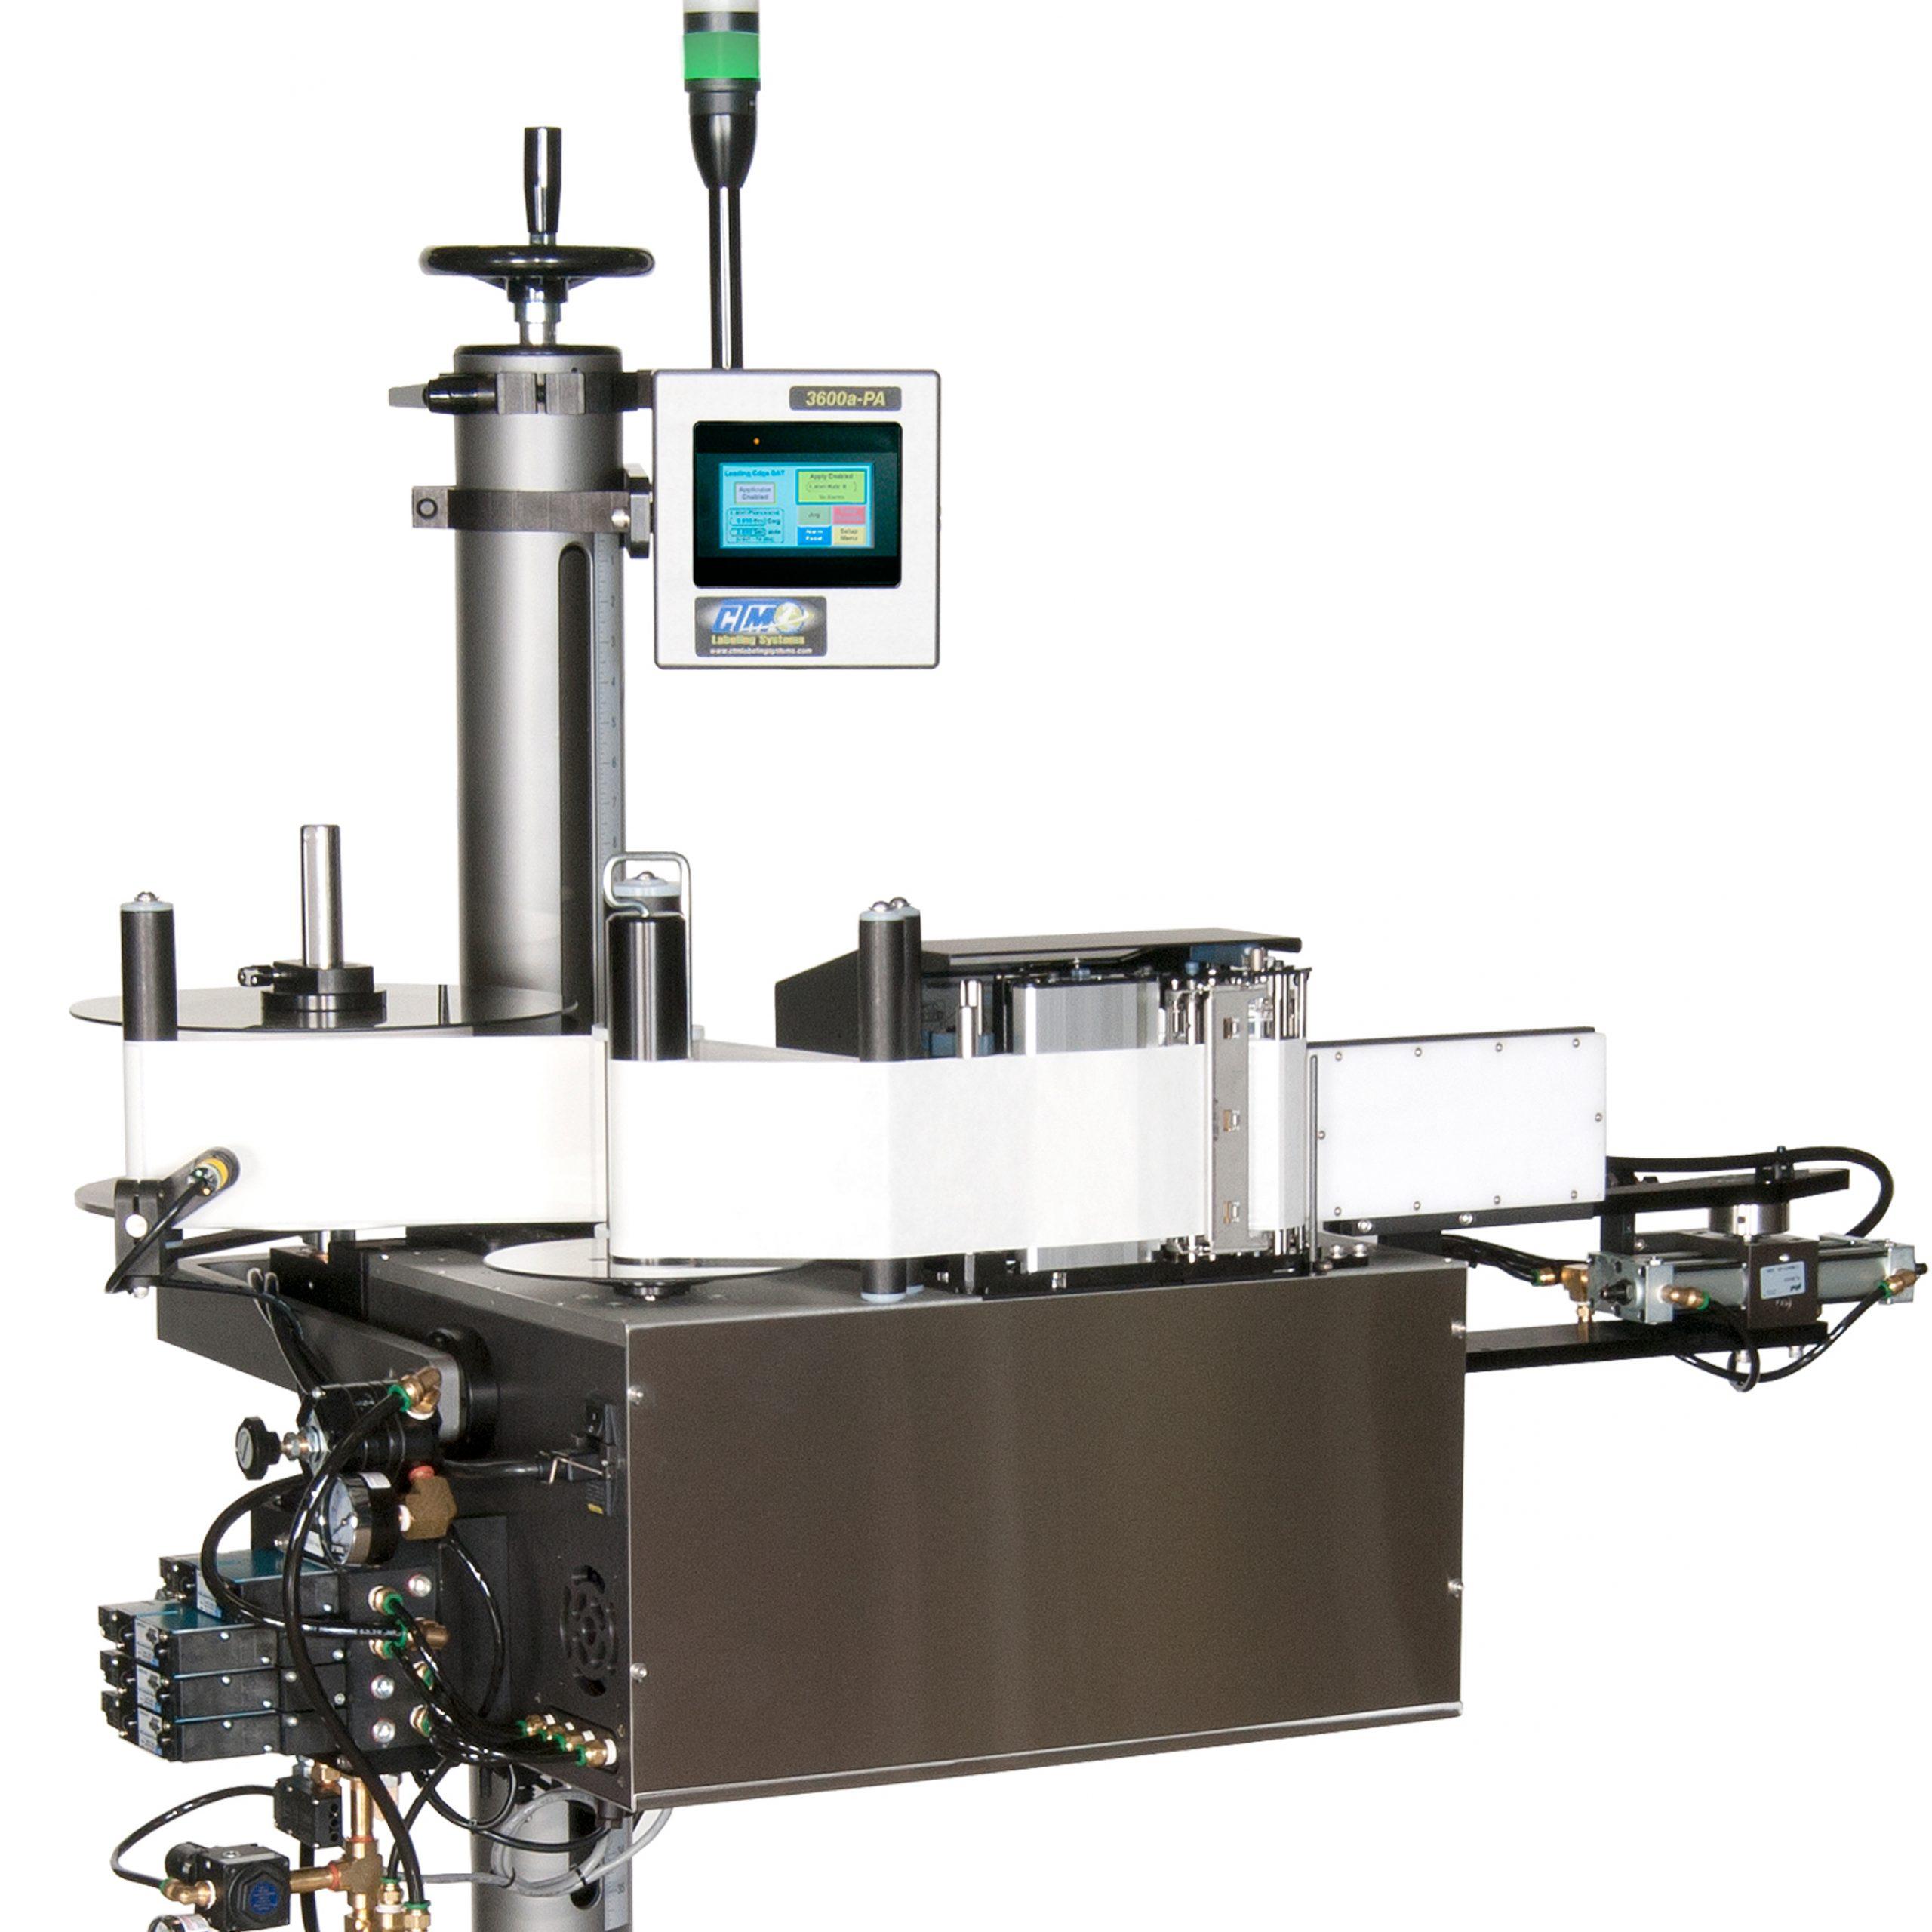 CTM Labeling Systems' Corner Wrap Printer Applicator